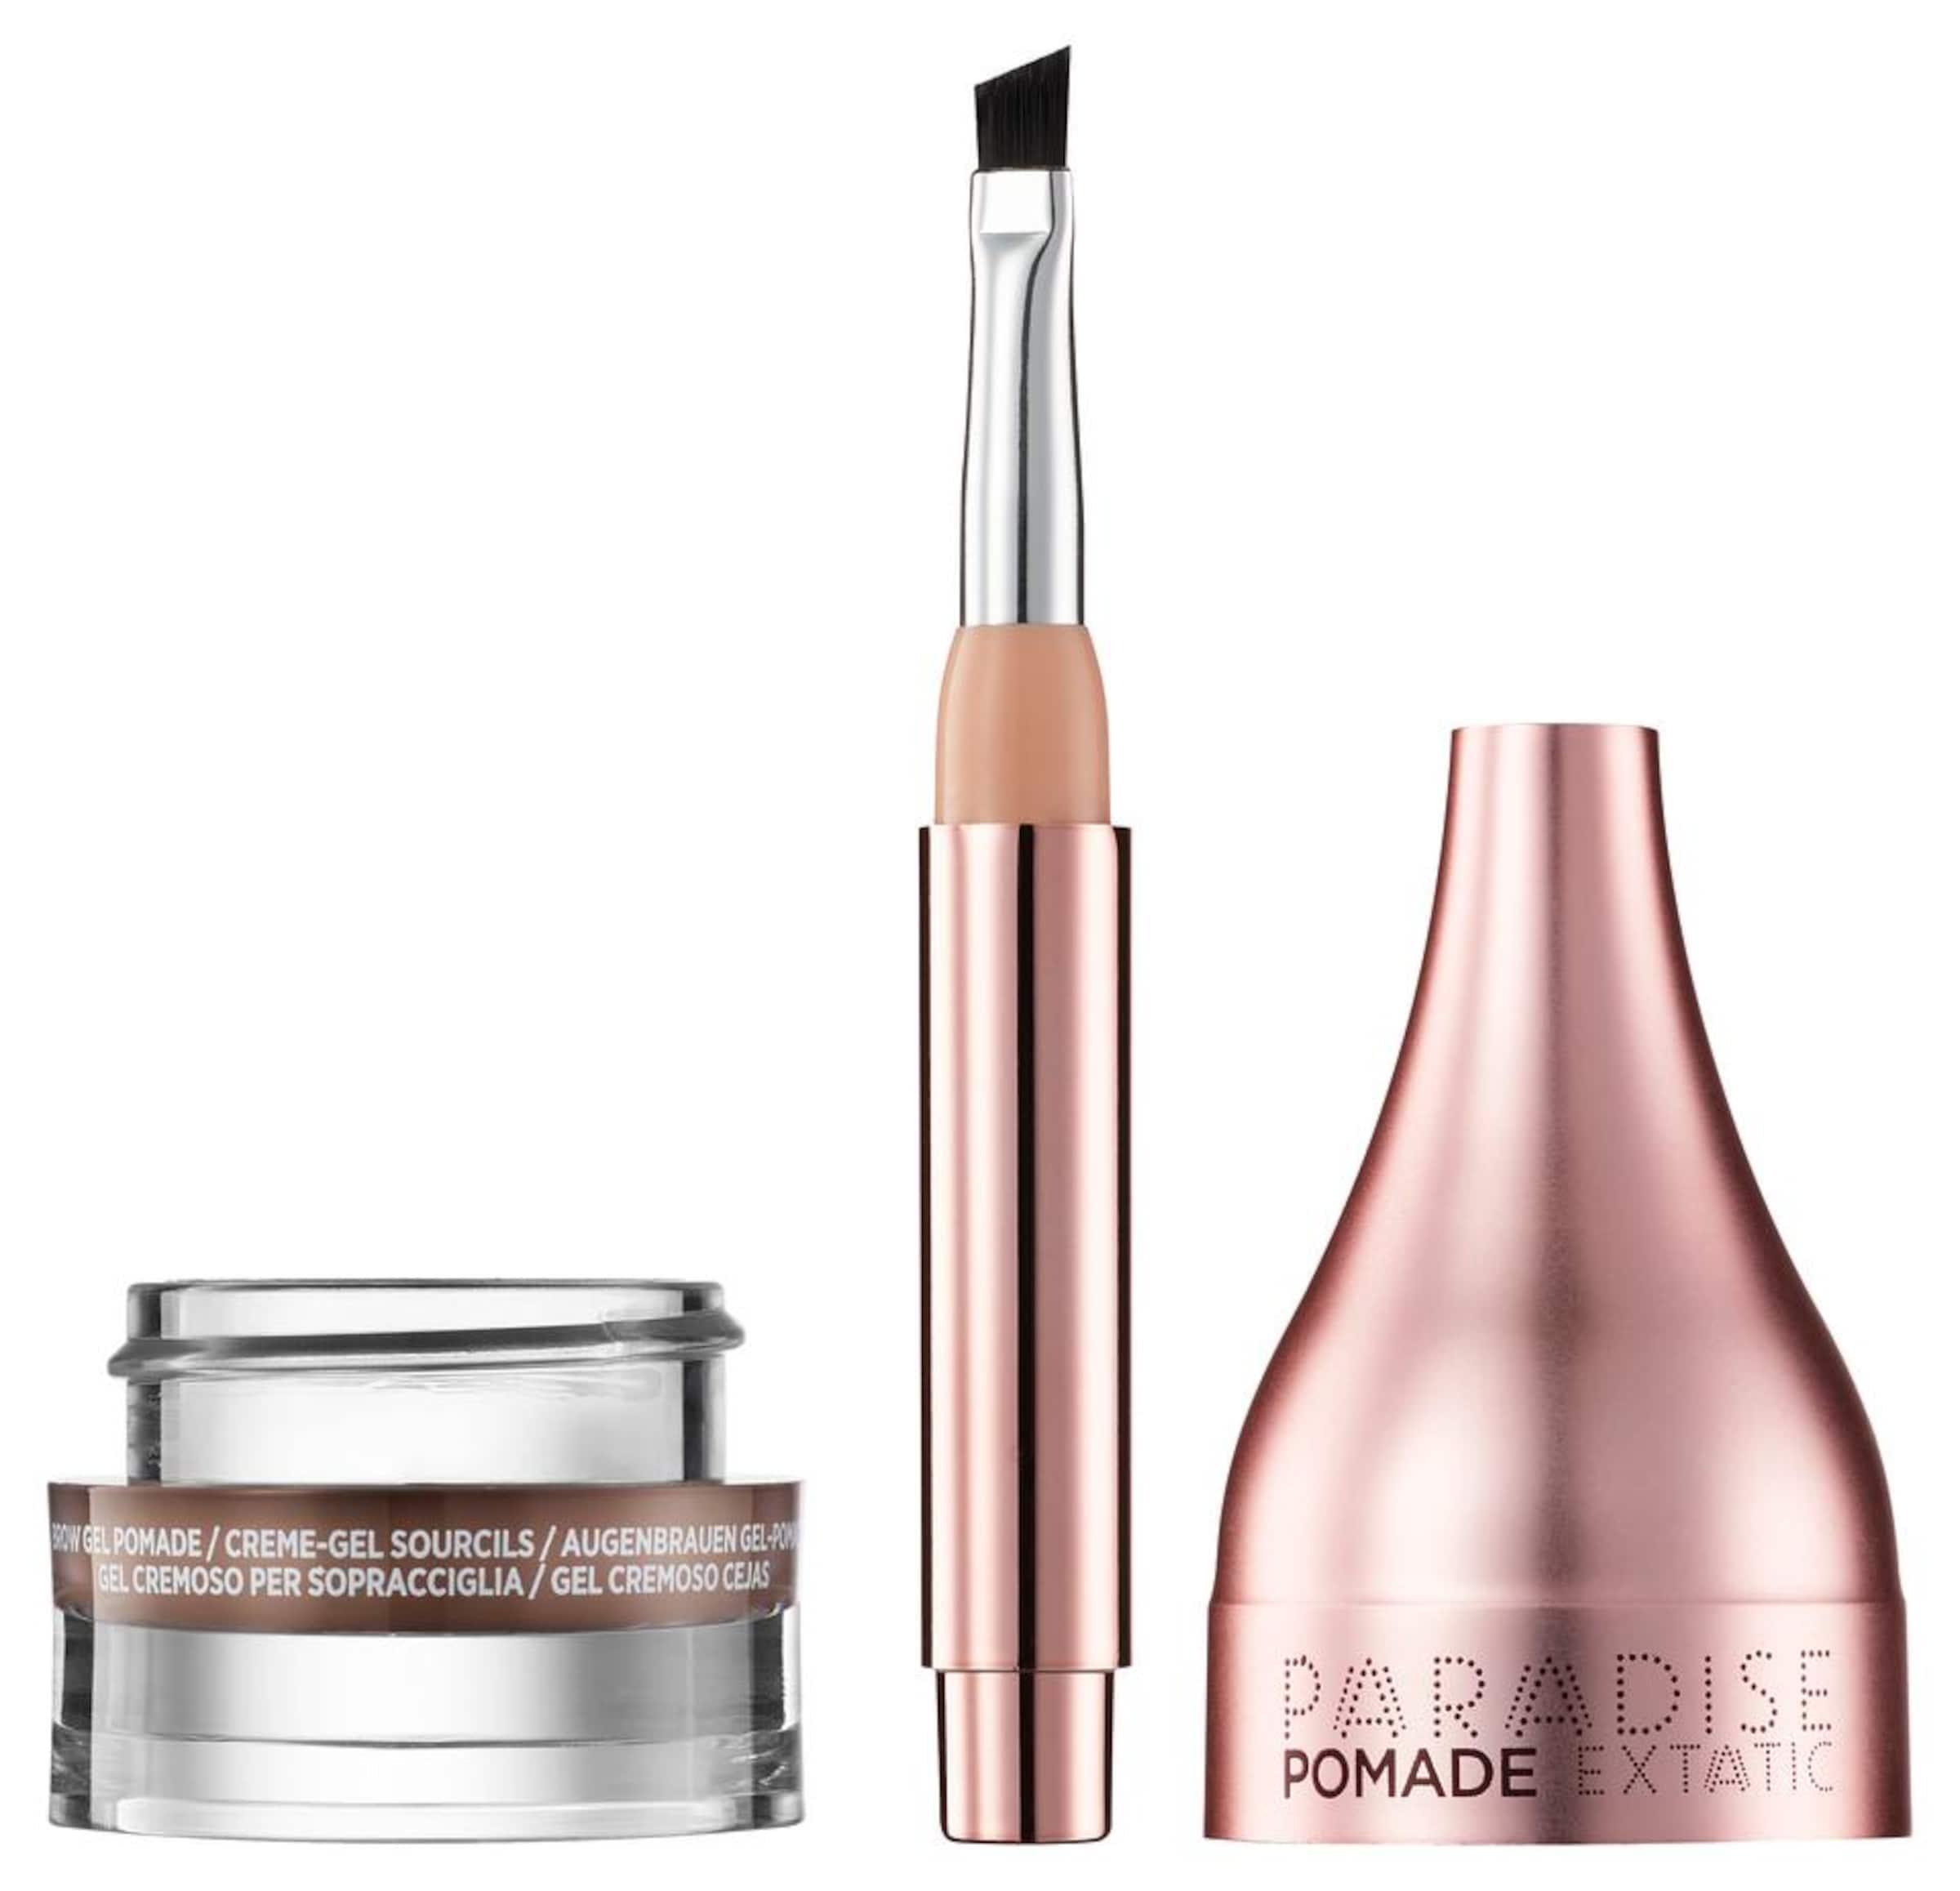 L'Oréal Paris 'Paradise Pomade Extatic' Augenbrauengel-Pomade Billig Verkauf Footaction Große Überraschung Verkauf Versorgung R3Y4wjb1bx